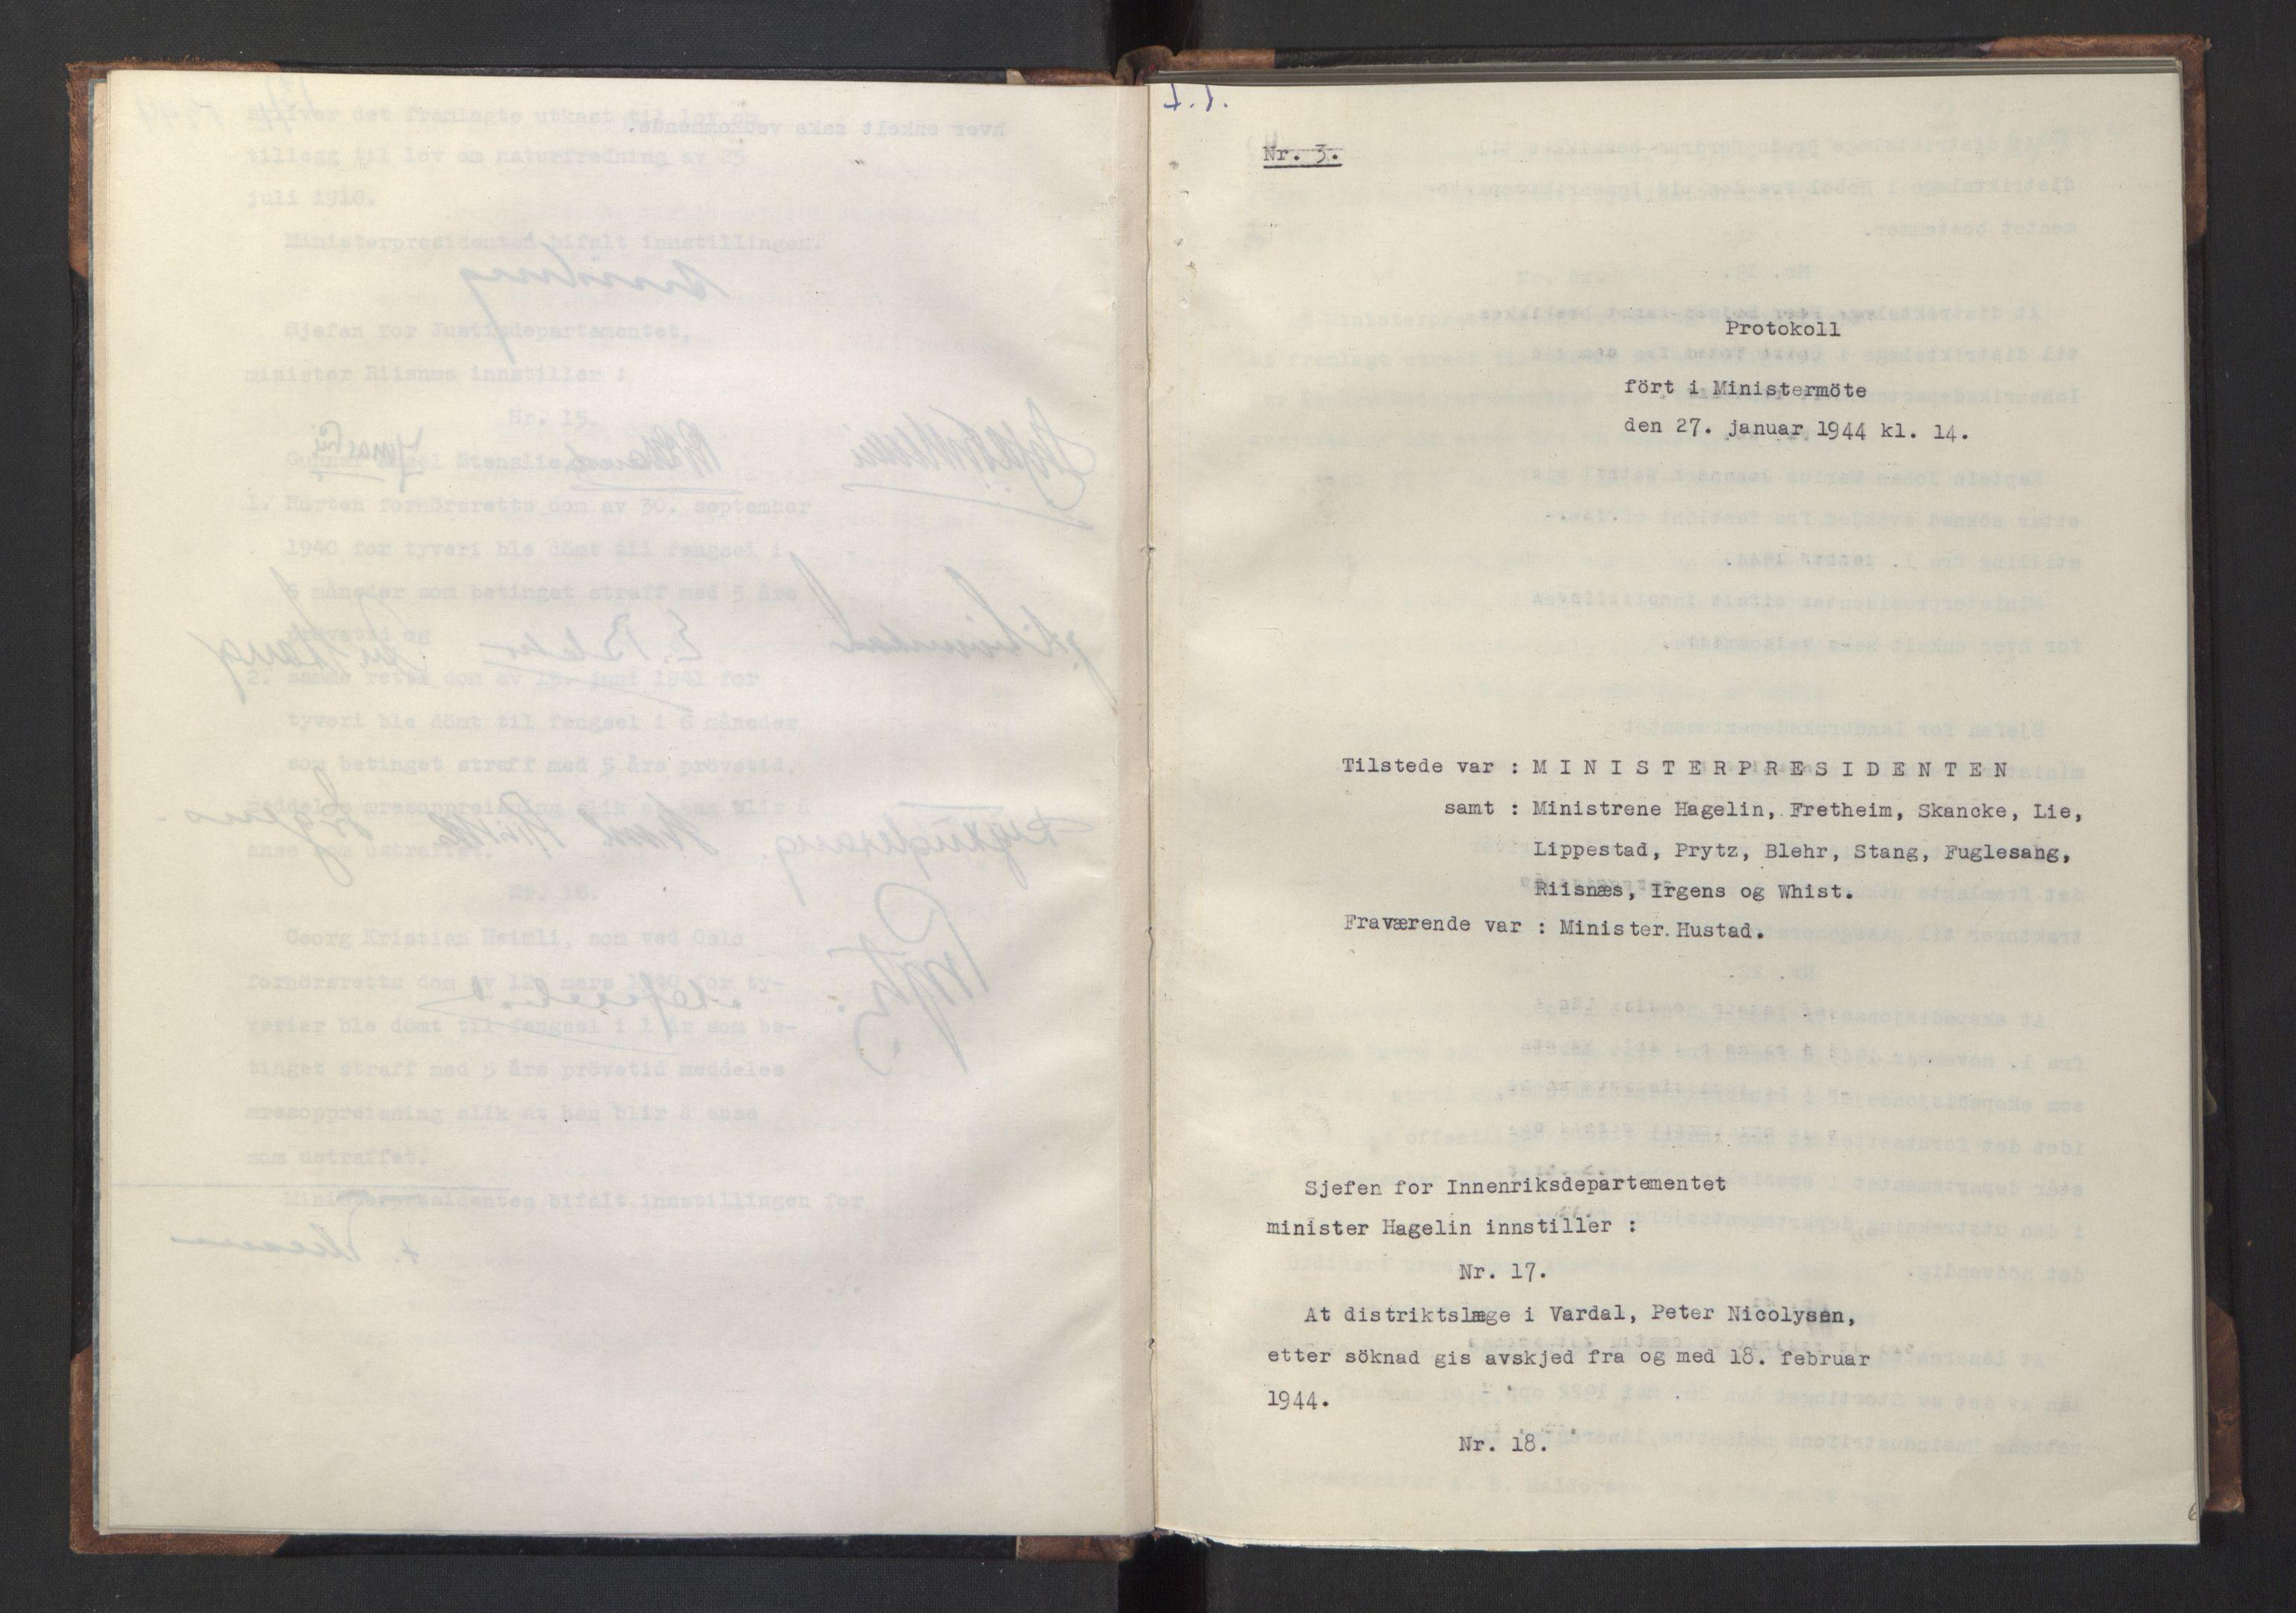 RA, NS-administrasjonen 1940-1945 (Statsrådsekretariatet, de kommisariske statsråder mm), D/Da/L0005: Protokoll fra ministermøter, 1944, s. 5b-6a